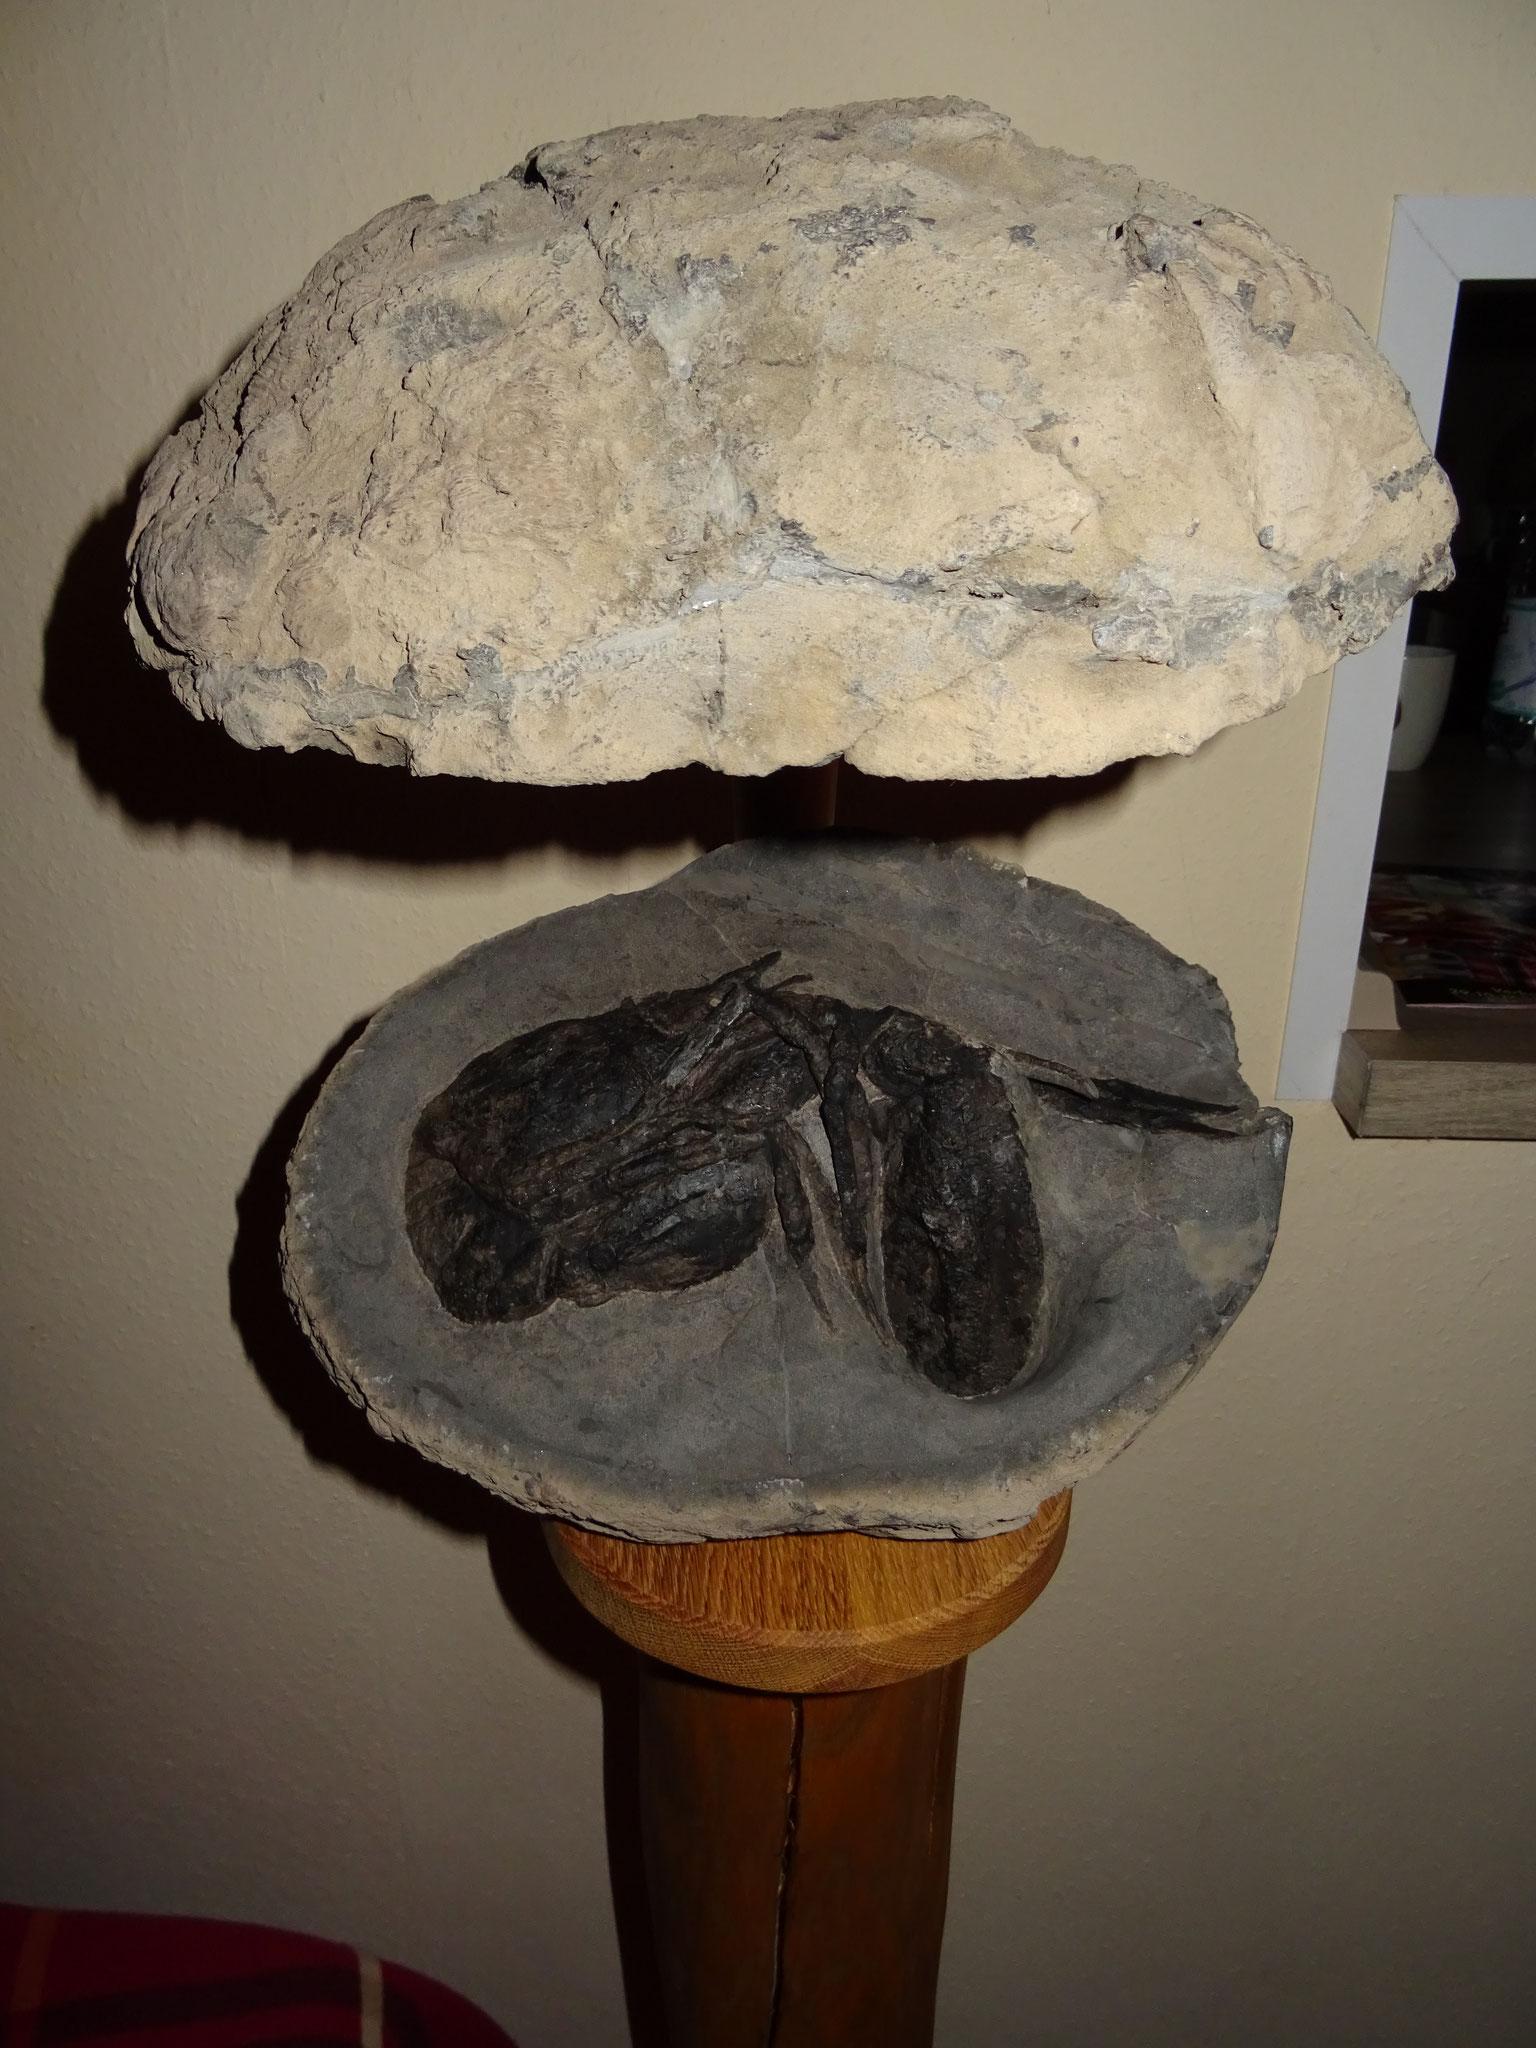 Phosphoritnodule with Homarus percyi from Leipzig Espenhain